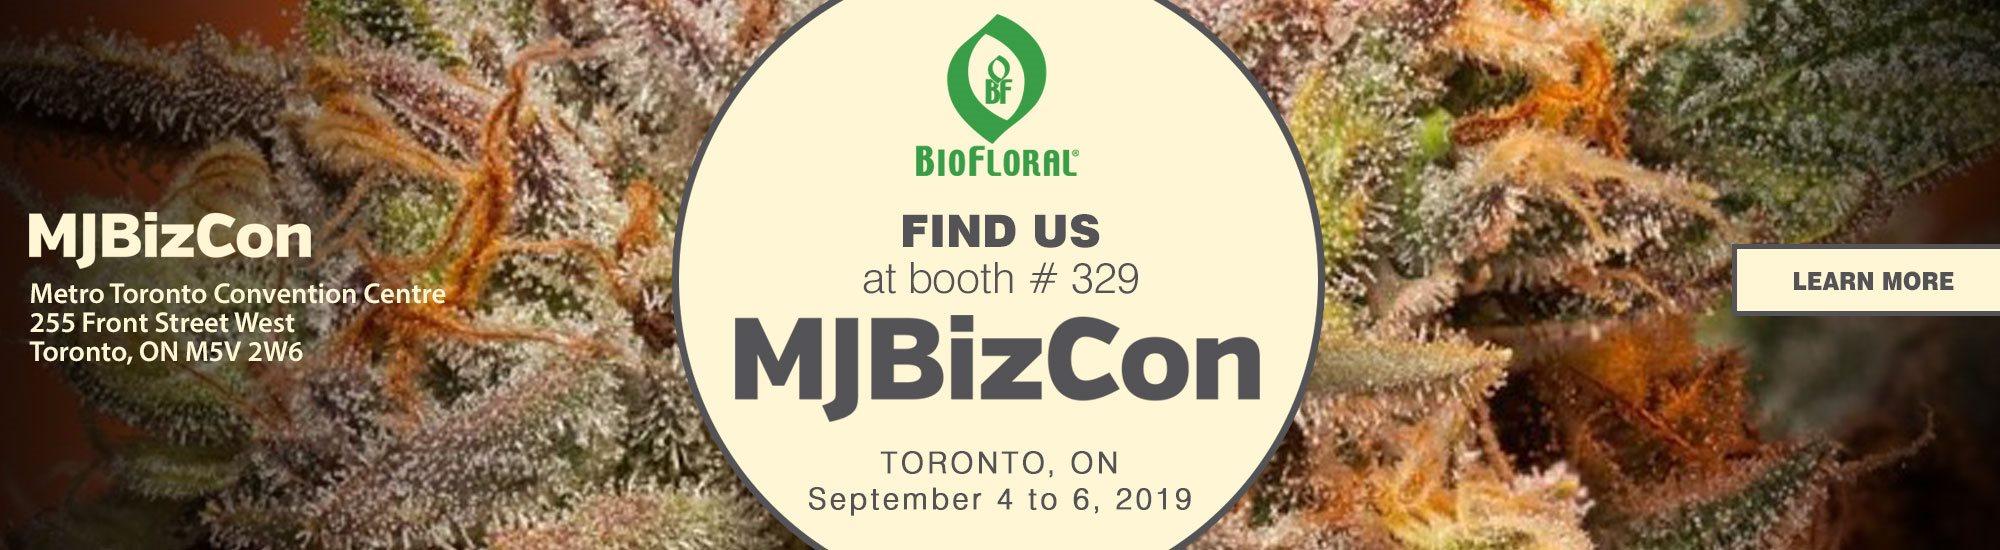 Meet us at MJBizCon Toronto